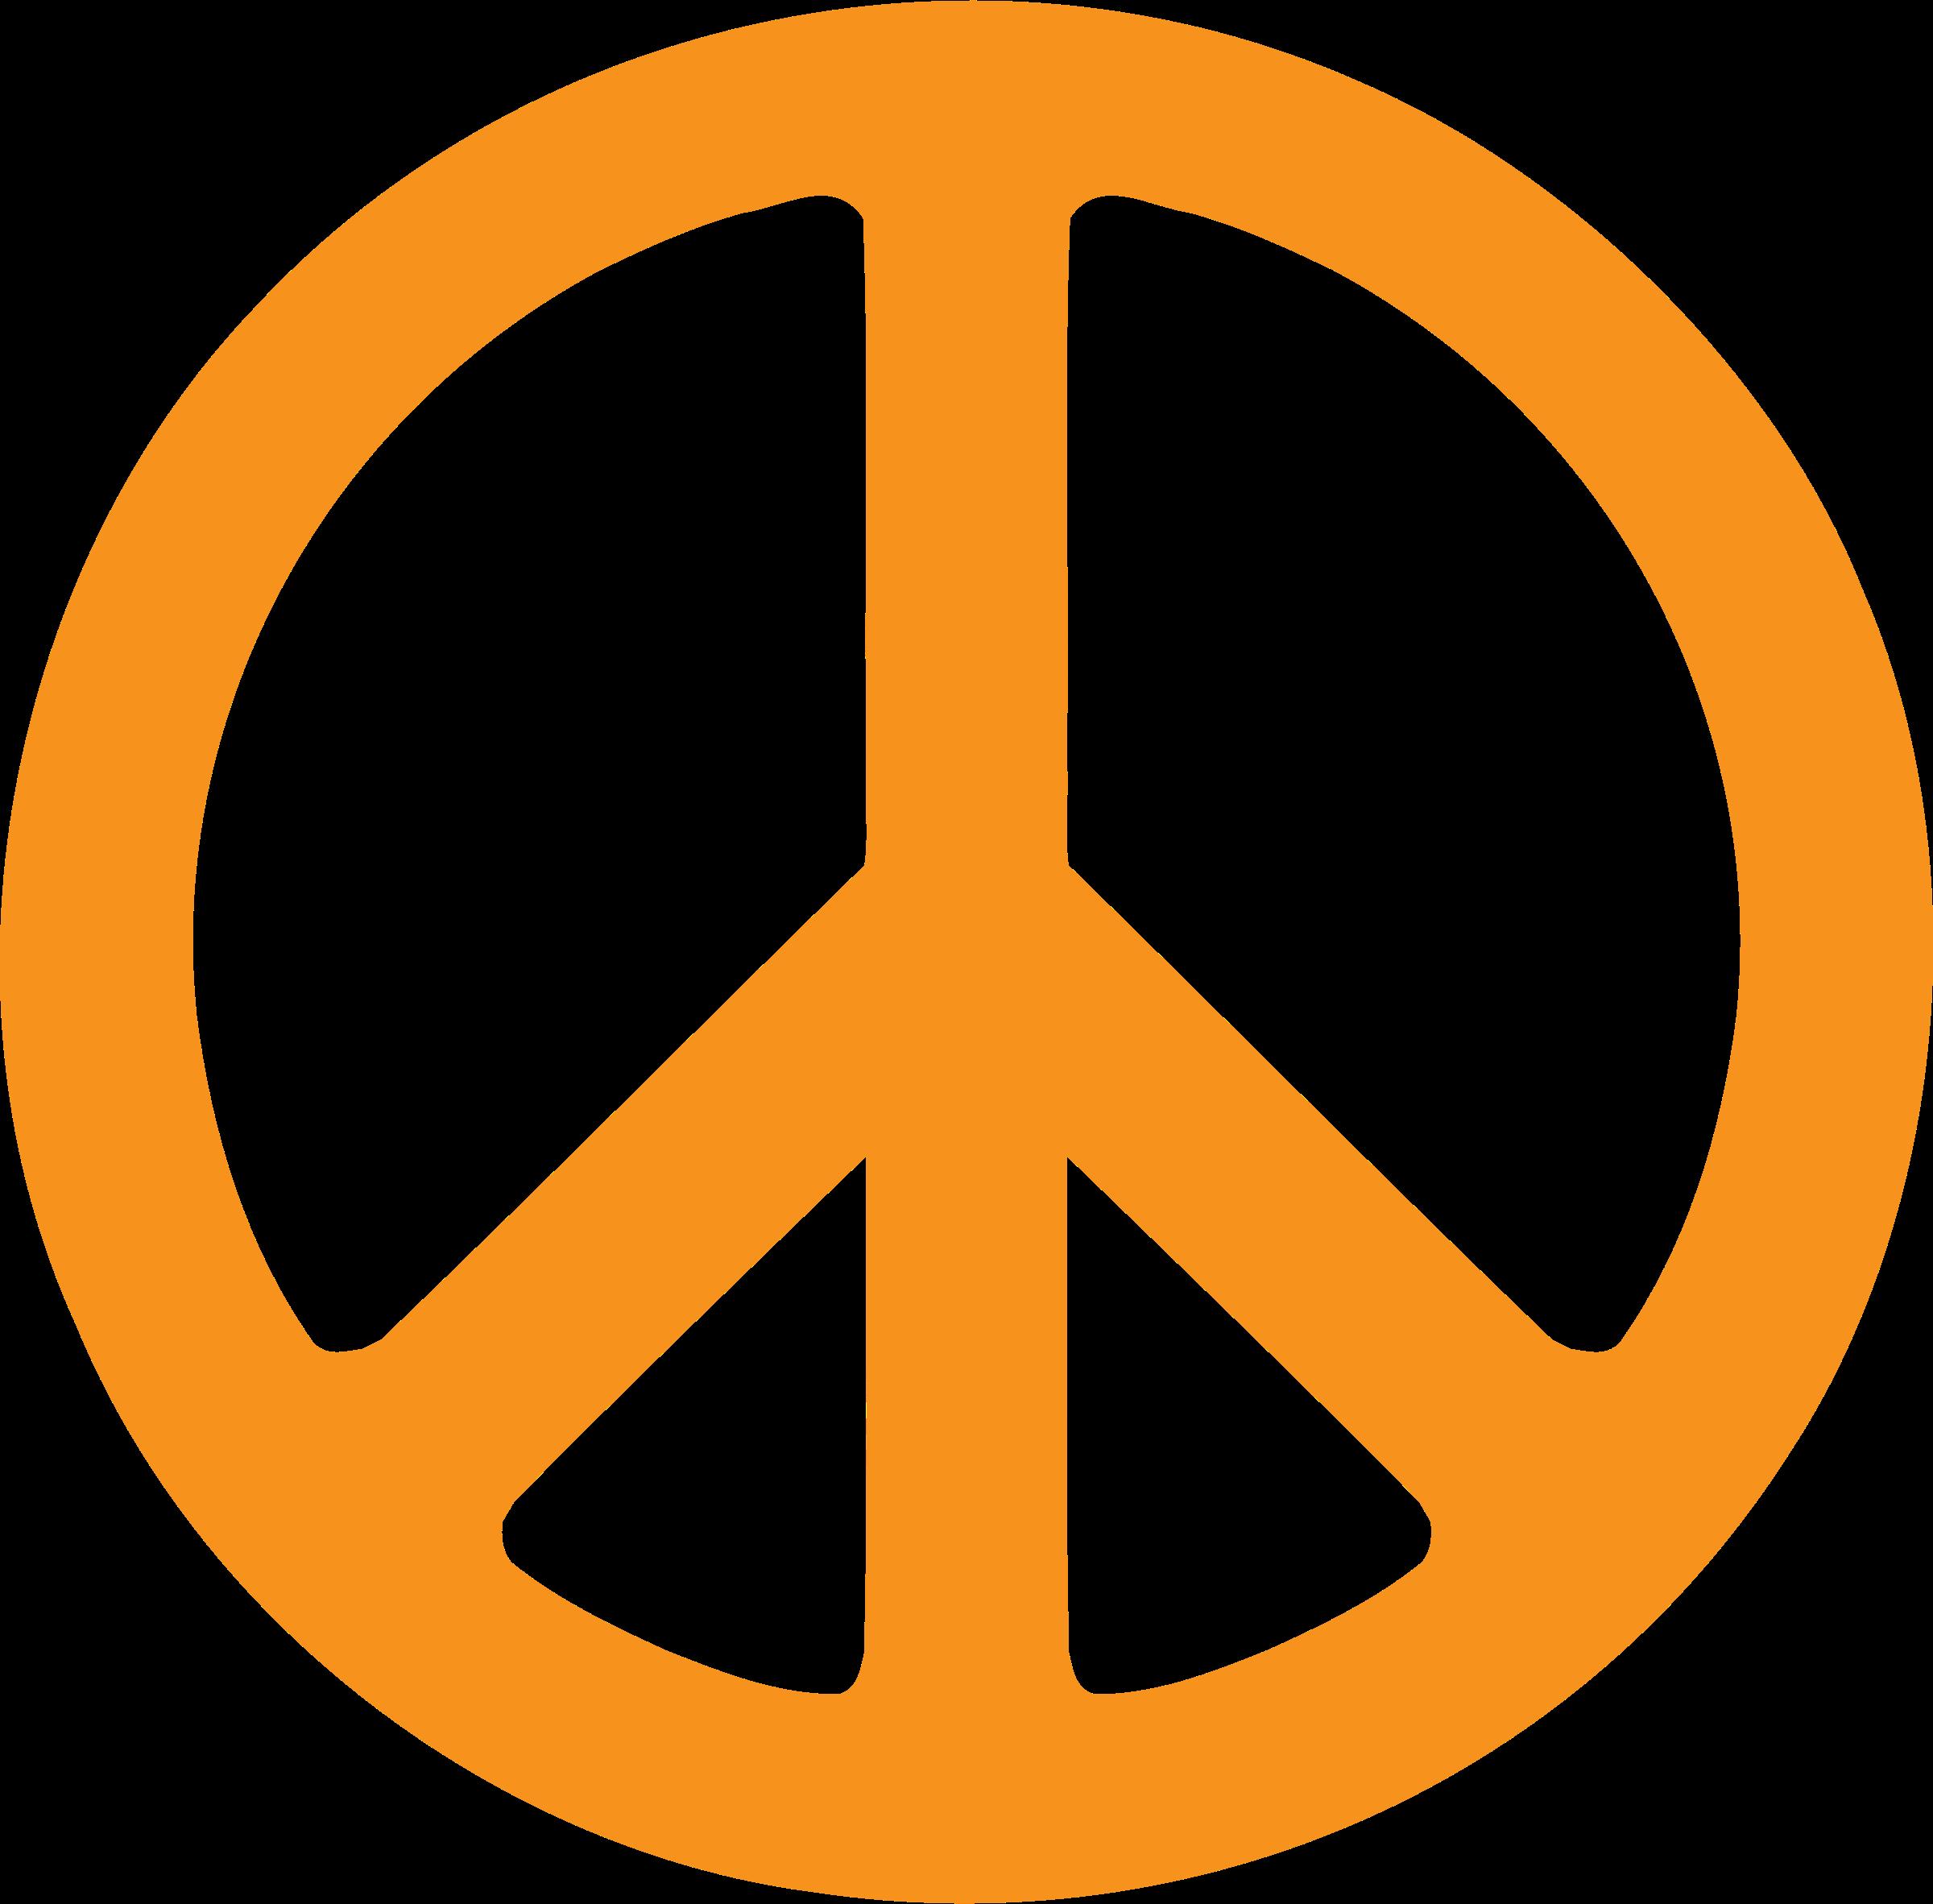 Paper clipart treaty. Peace symbol png transparent